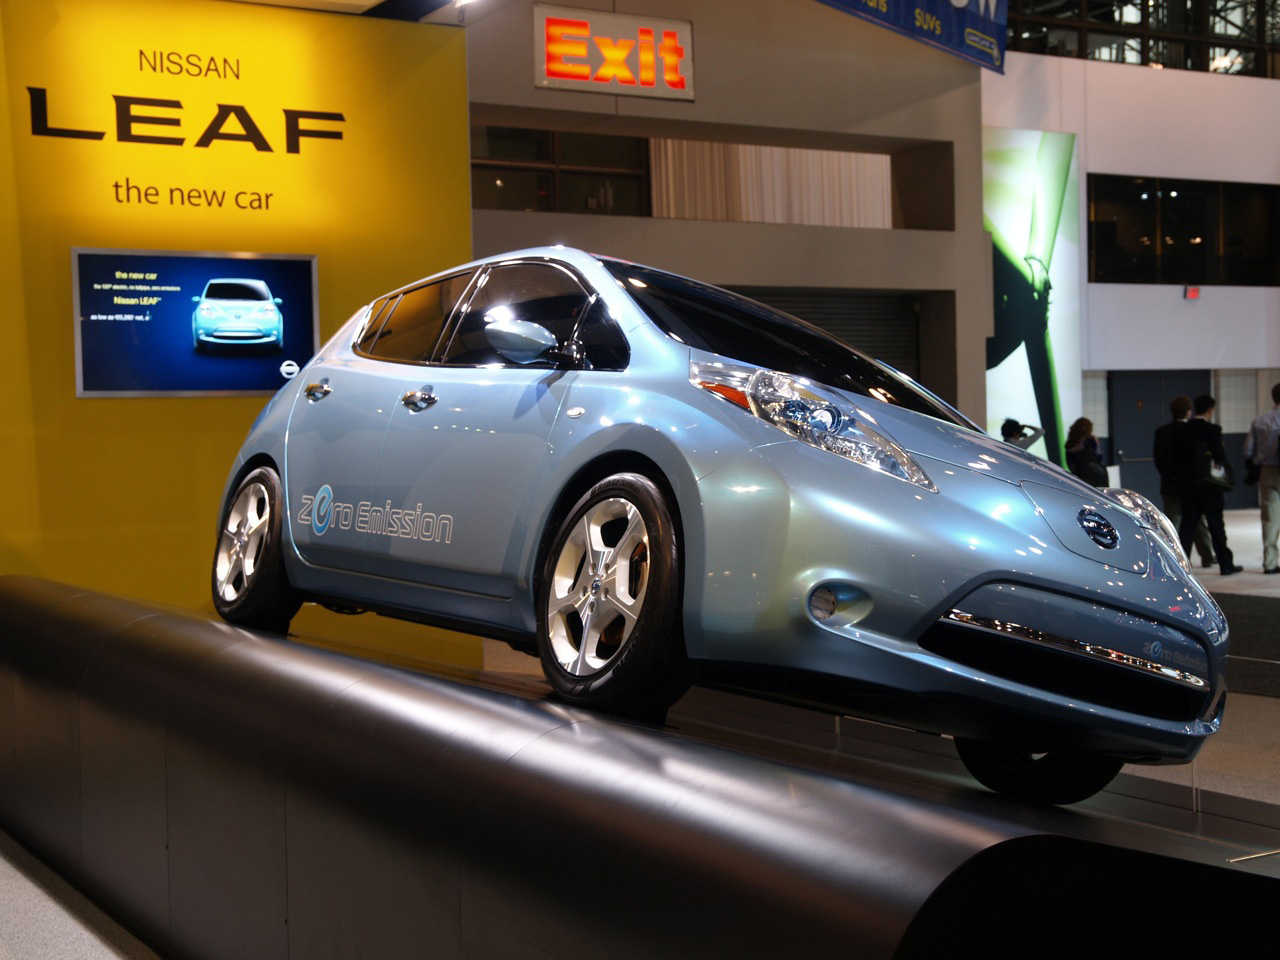 Nissan LEAF Wins 2011 World Car of the Year